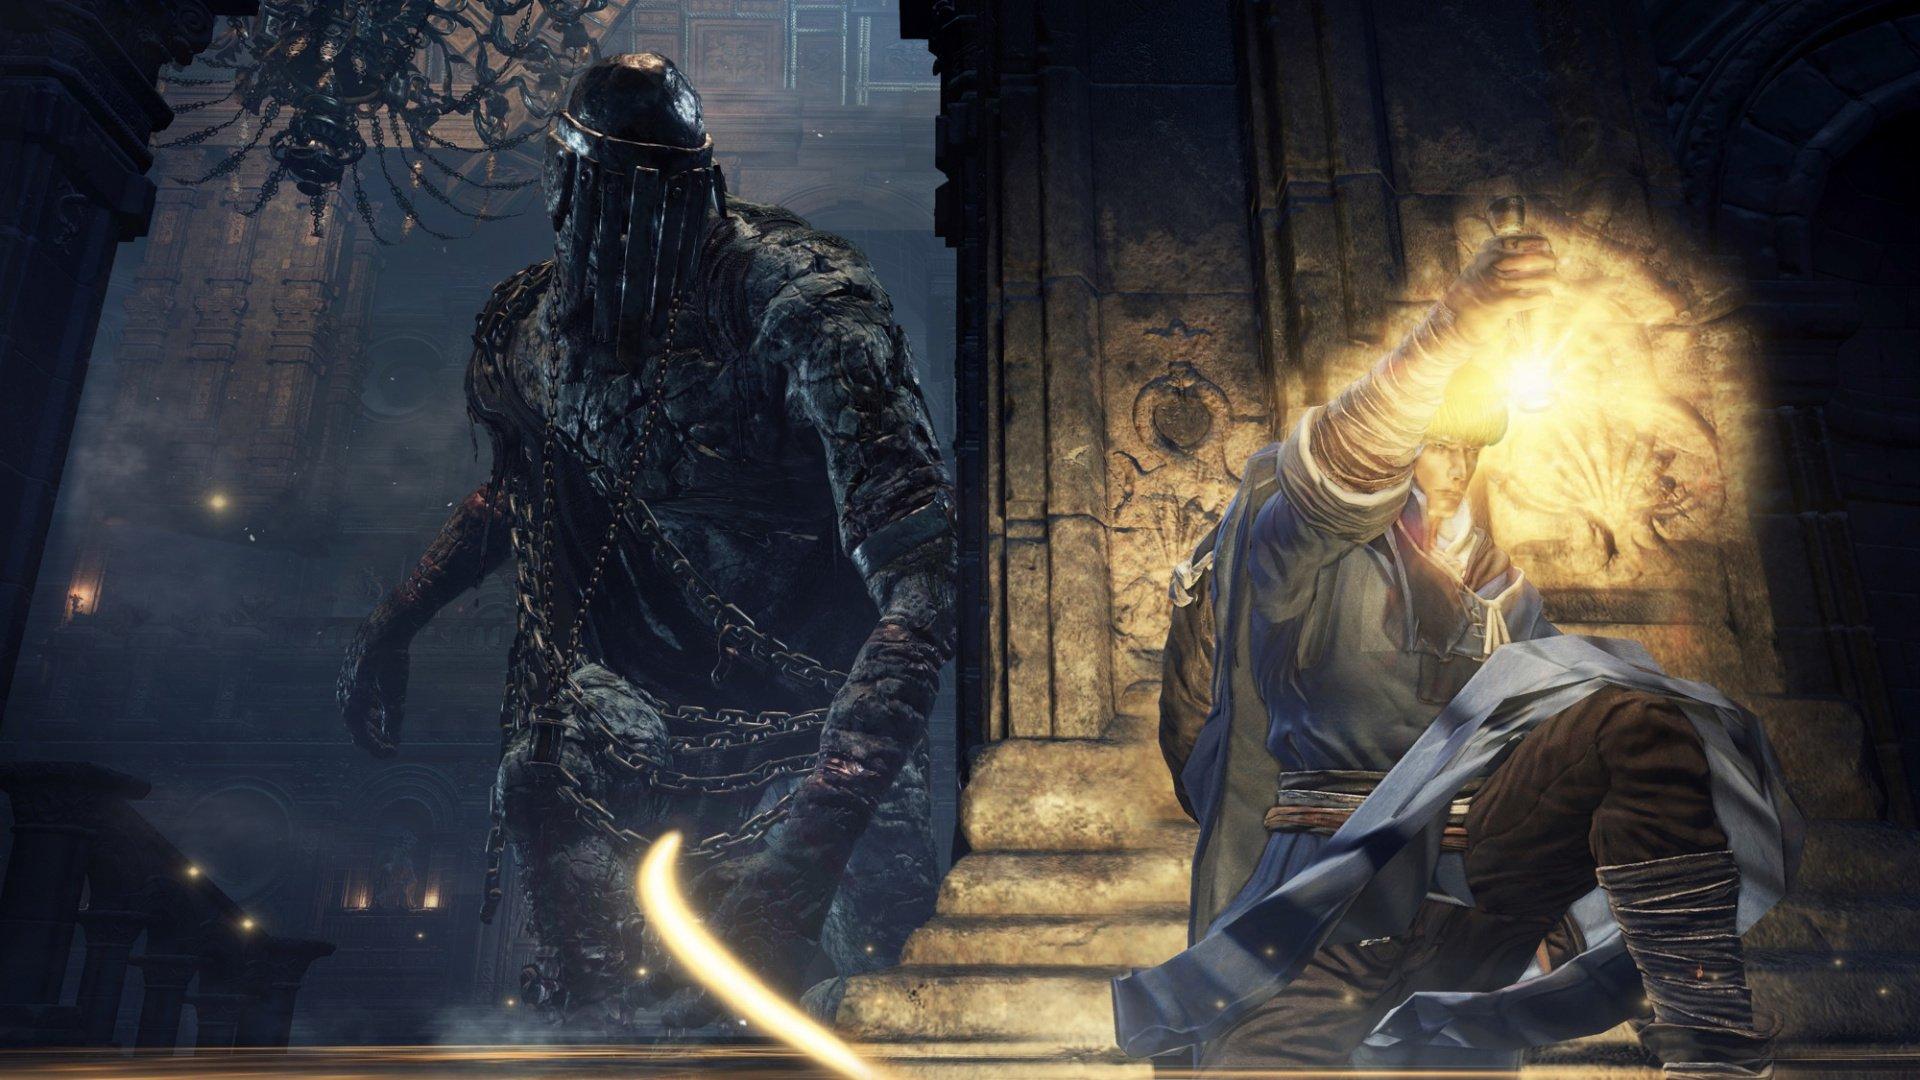 Dark Souls III (PS4 / PlayStation 4) Game Profile | News ...